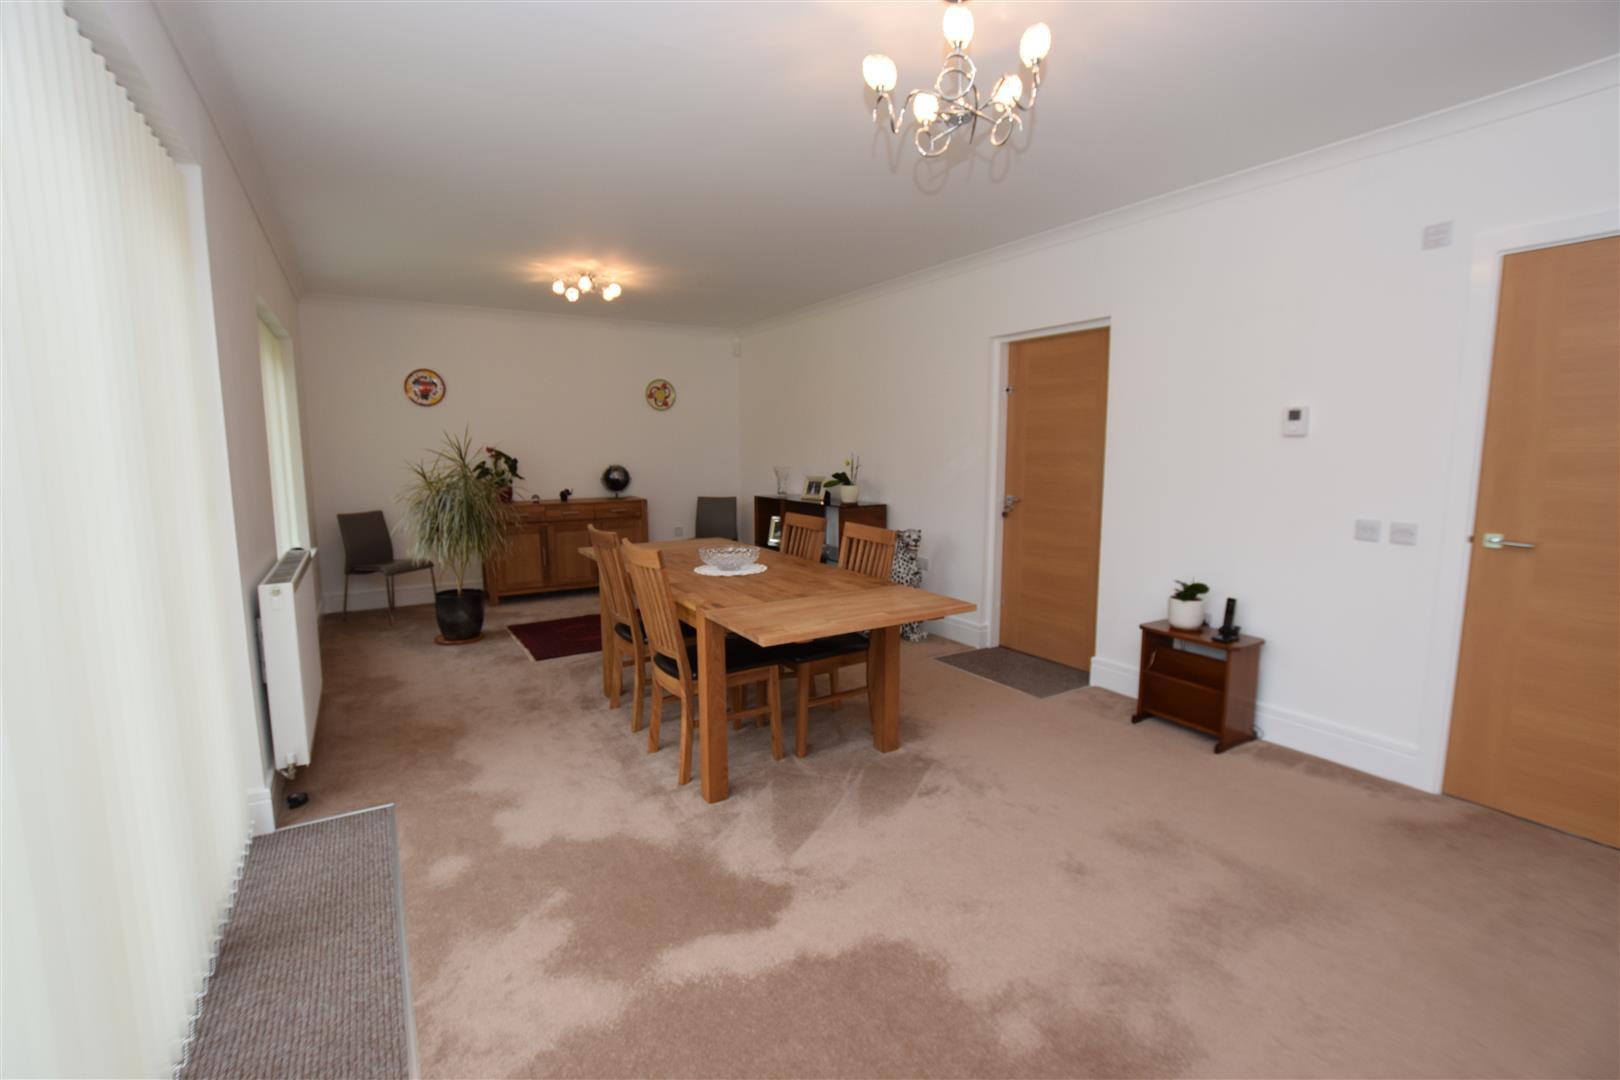 13, Kirkfield Place, Auchterarder, Perthshire, PH3 1FP, UK